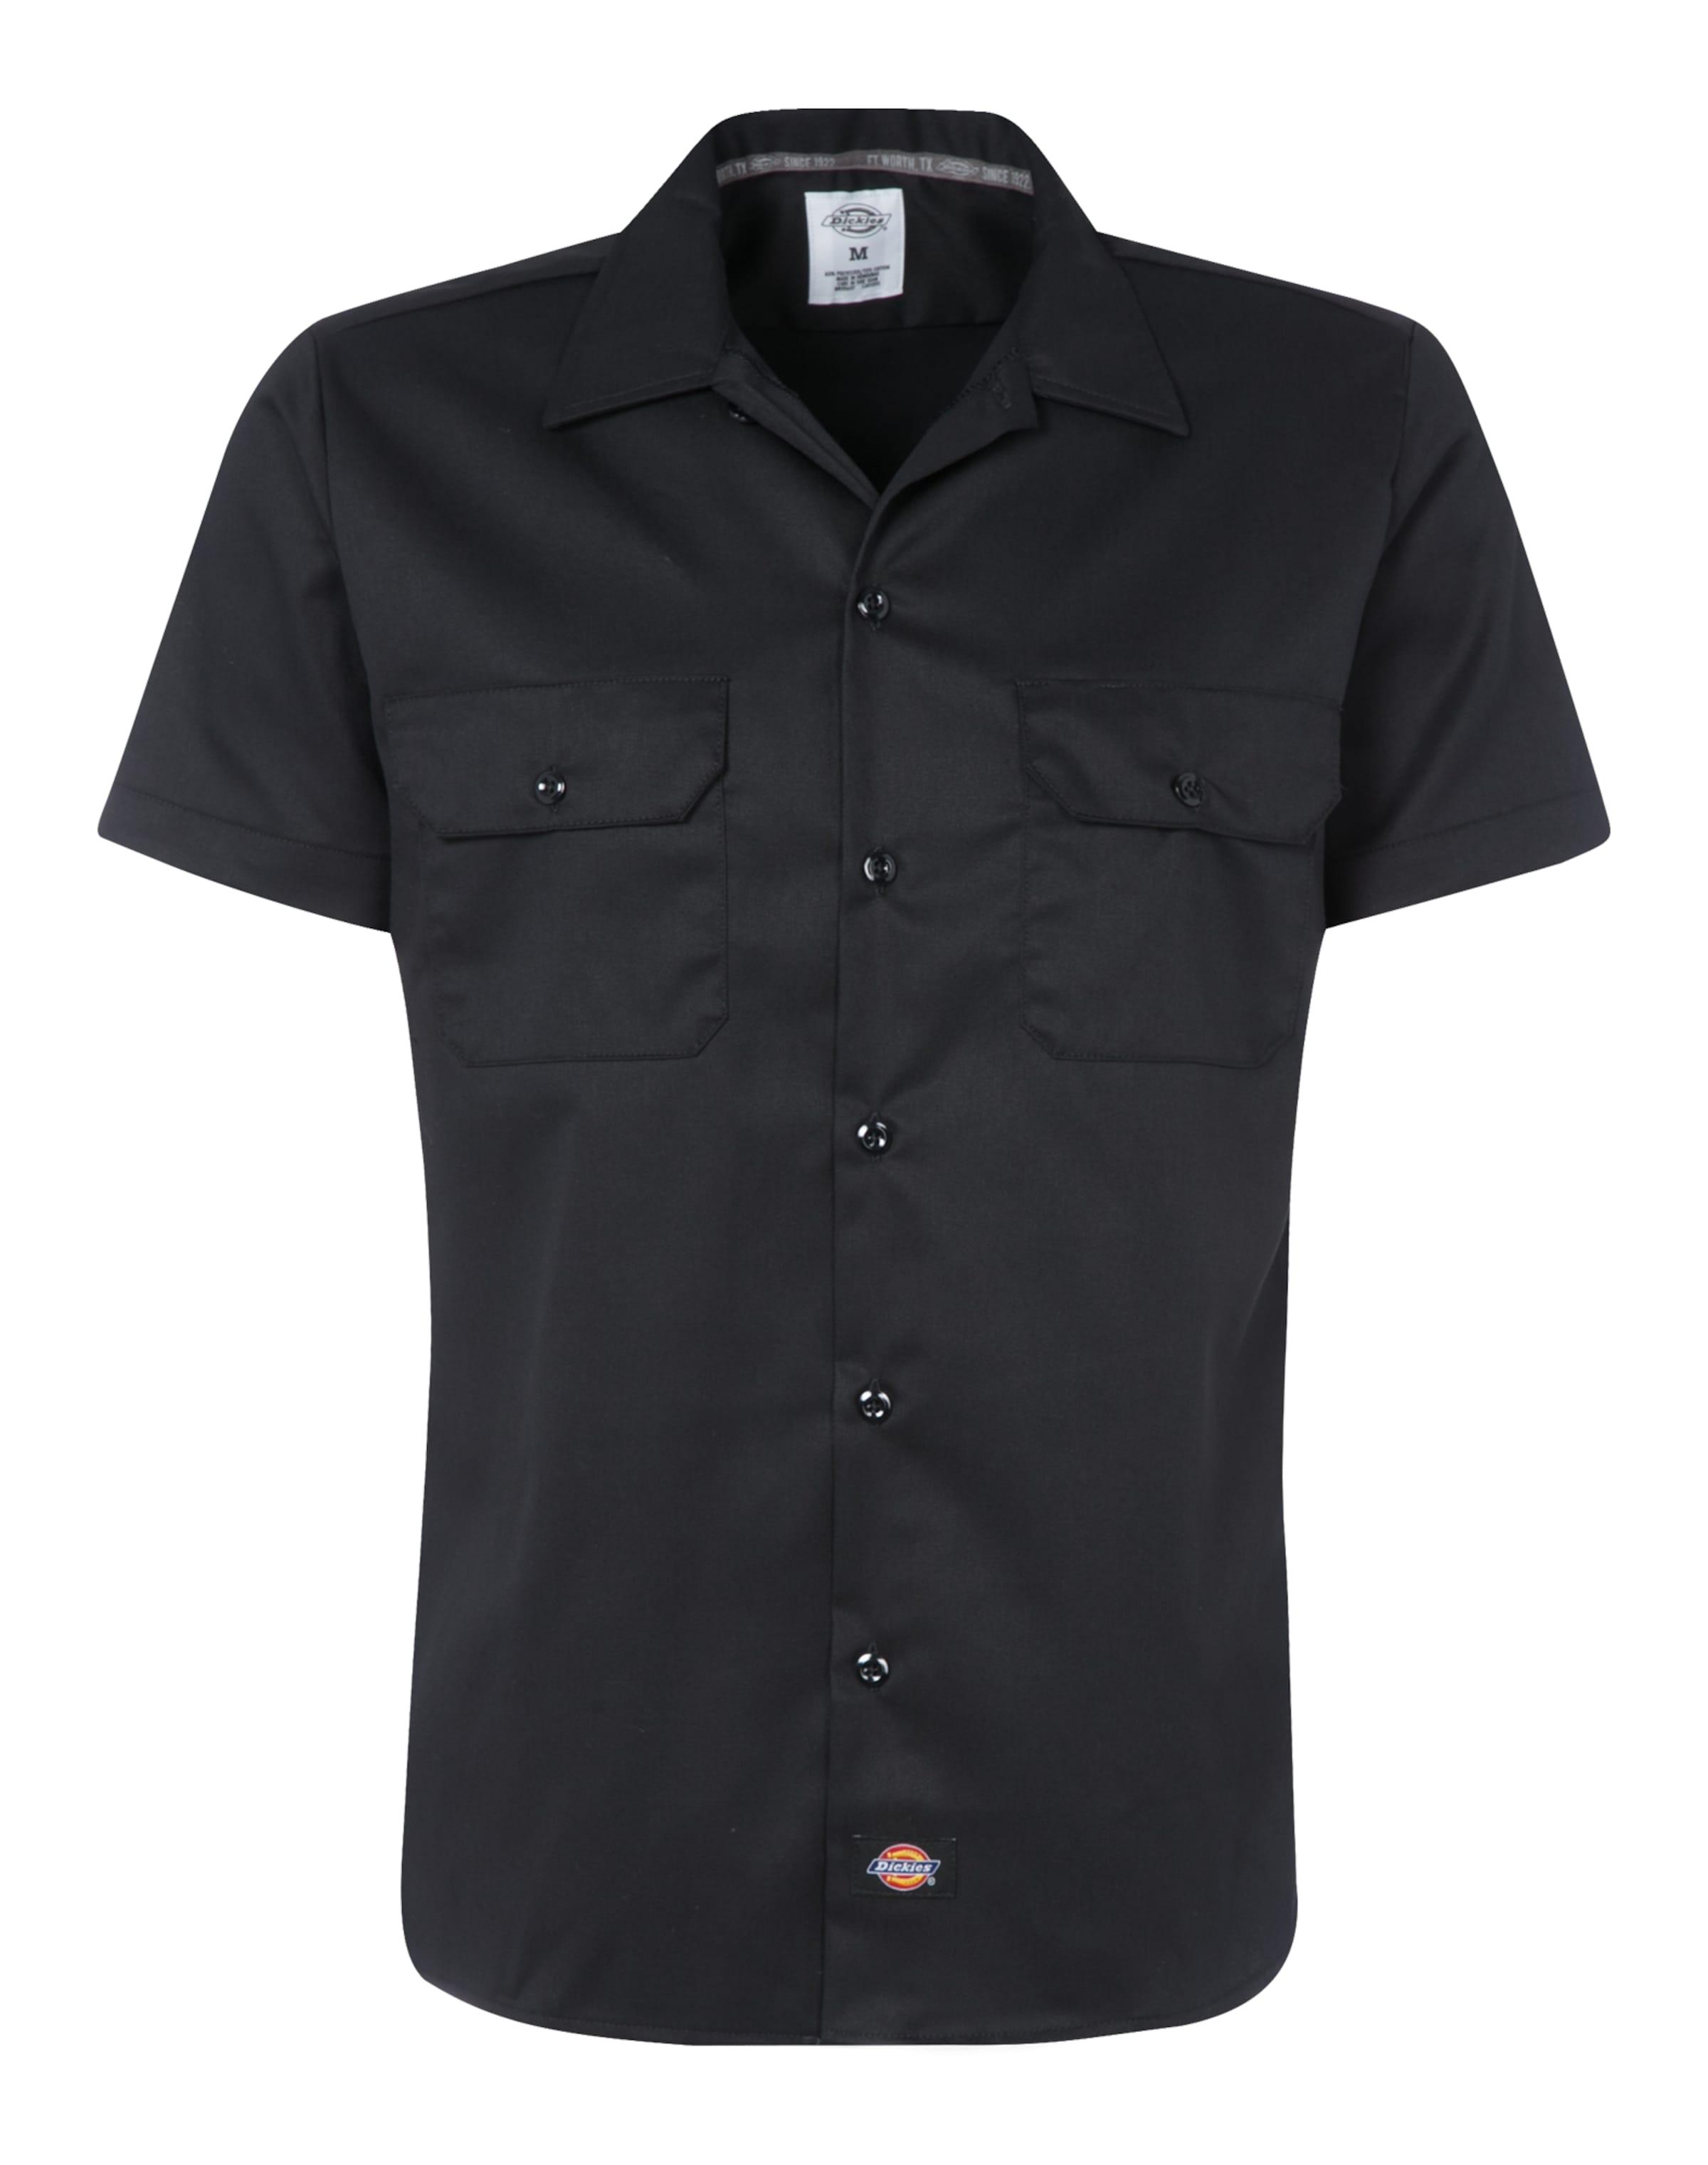 In Ws576 Dickies Hemd Slim Shirt Schwarz PuXZkTOwil